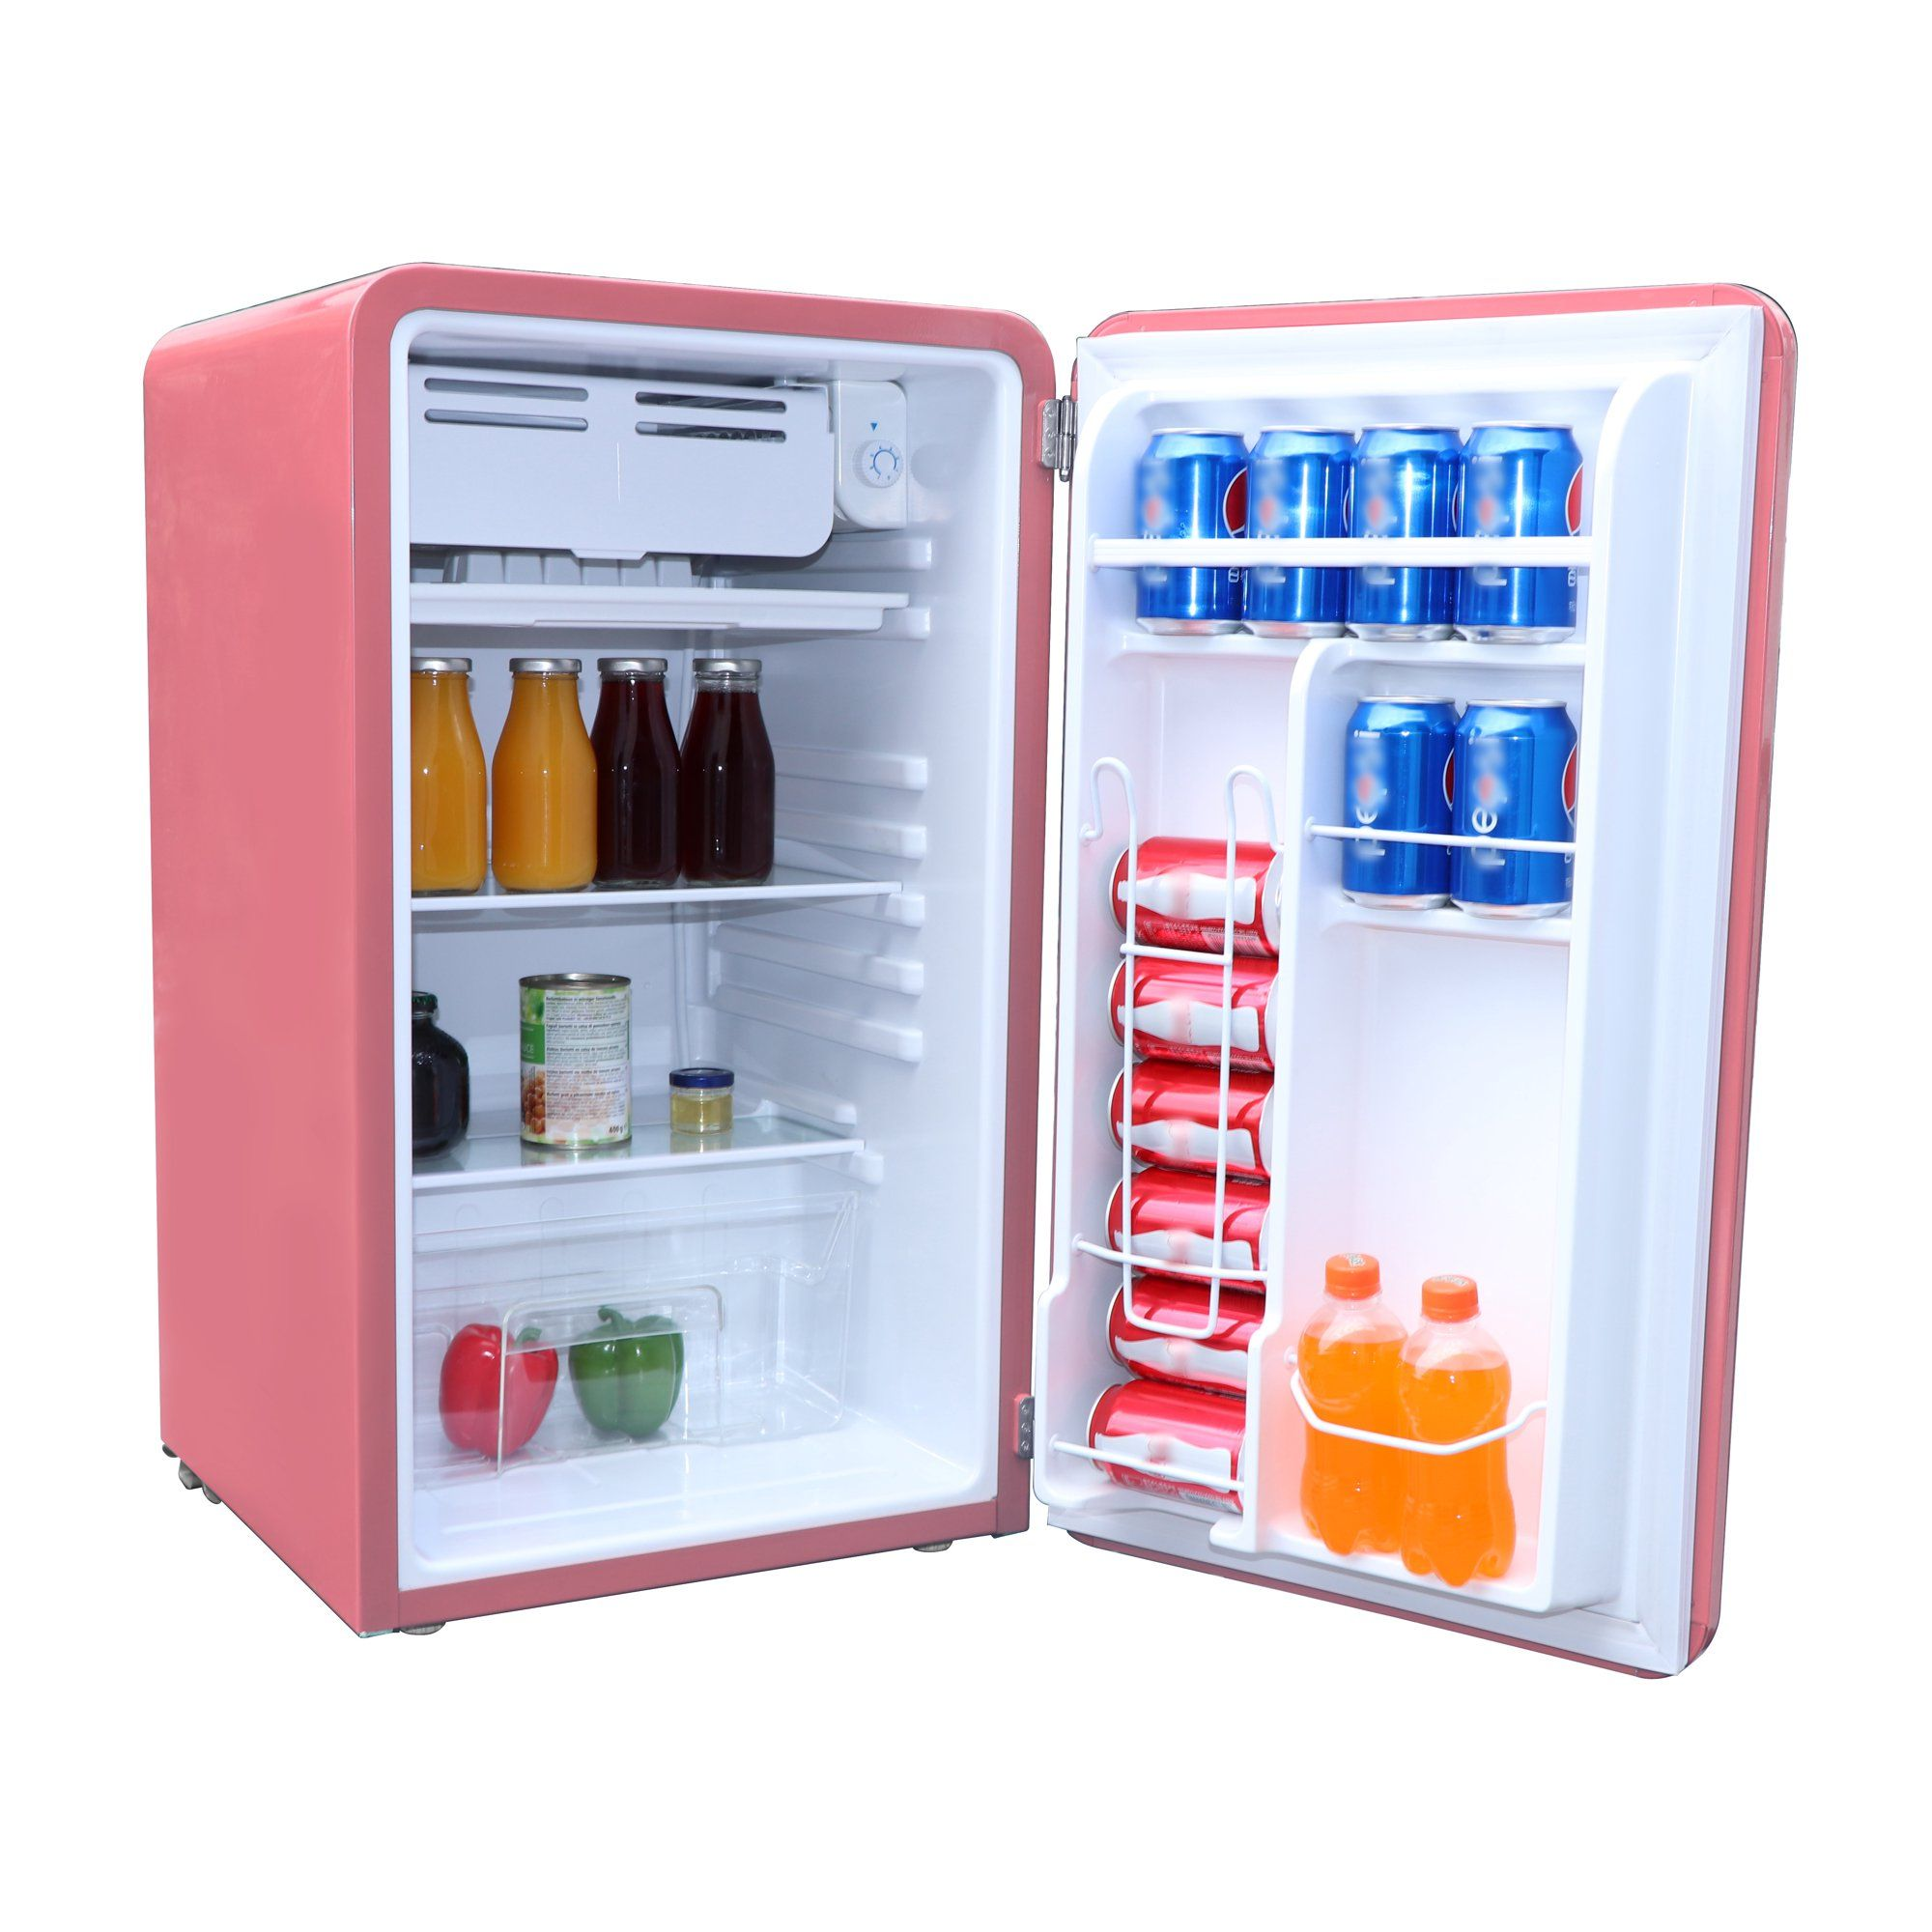 Frigidaire 3 2 Cu Ft Single Door Retro Compact Refrigerator Efr372 Blue Walmart Com In 2020 Mini Fridge Compact Fridge Retro Fridge